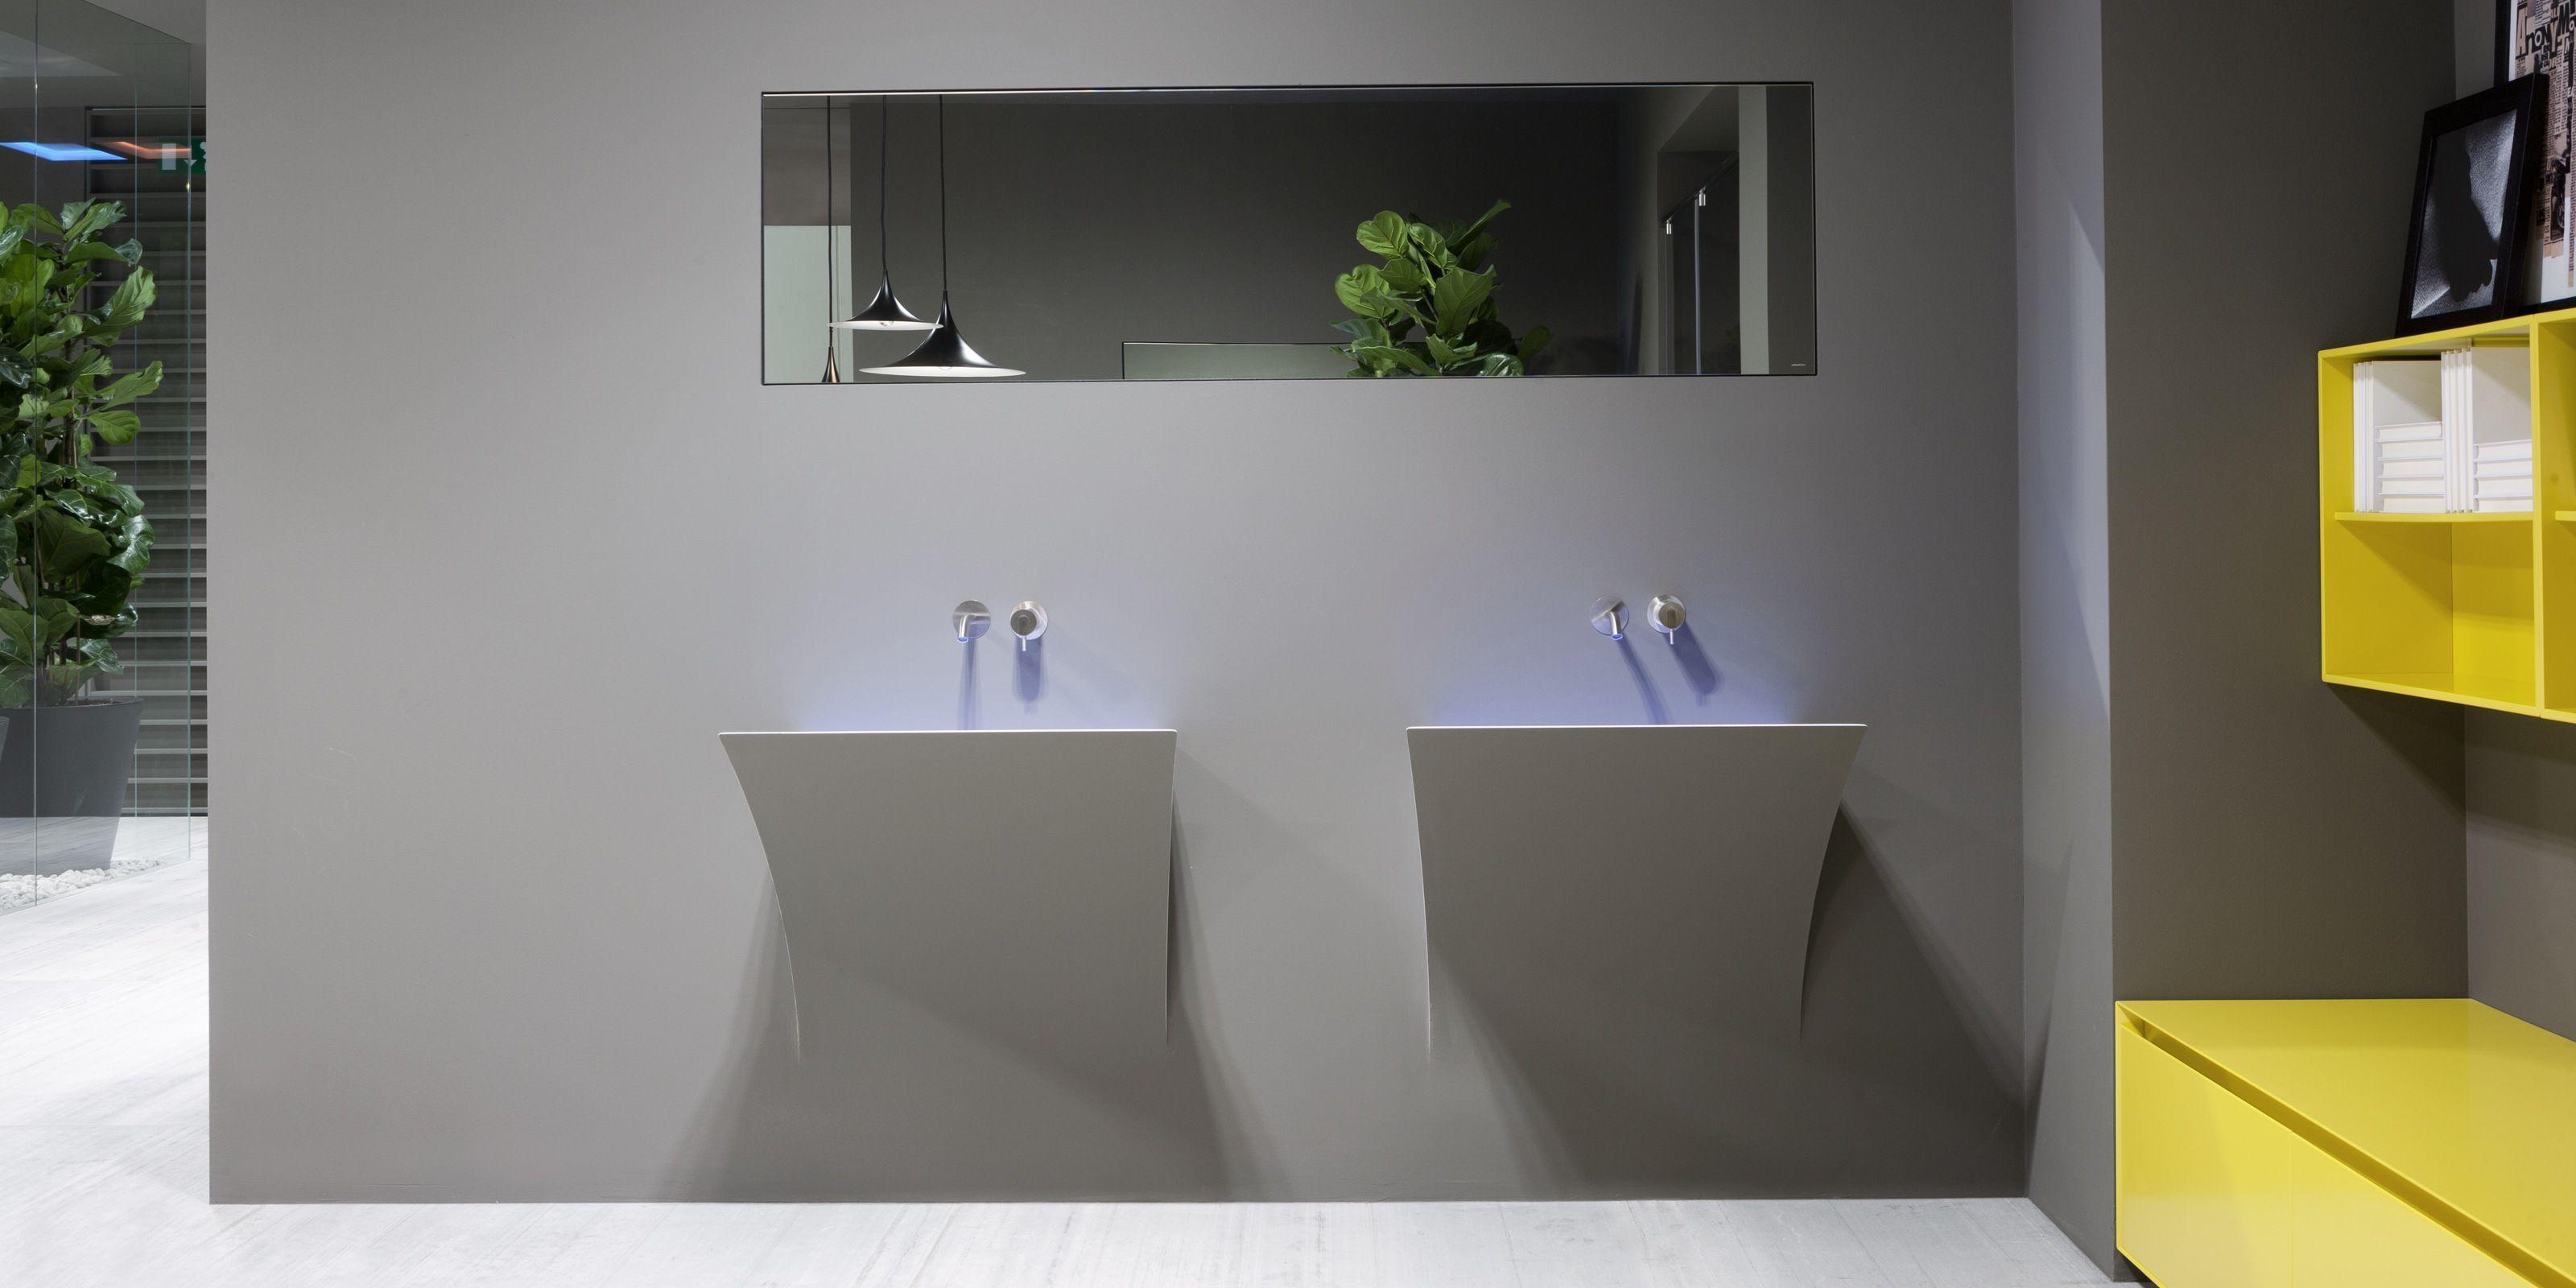 RILIEVO SINKS BY ANTONIOLUPI | AMBIENT / Modern Bathroom Sinks | Pinterest  | Sinks, Modern Bathroom And Bathroom Designs Pictures Gallery